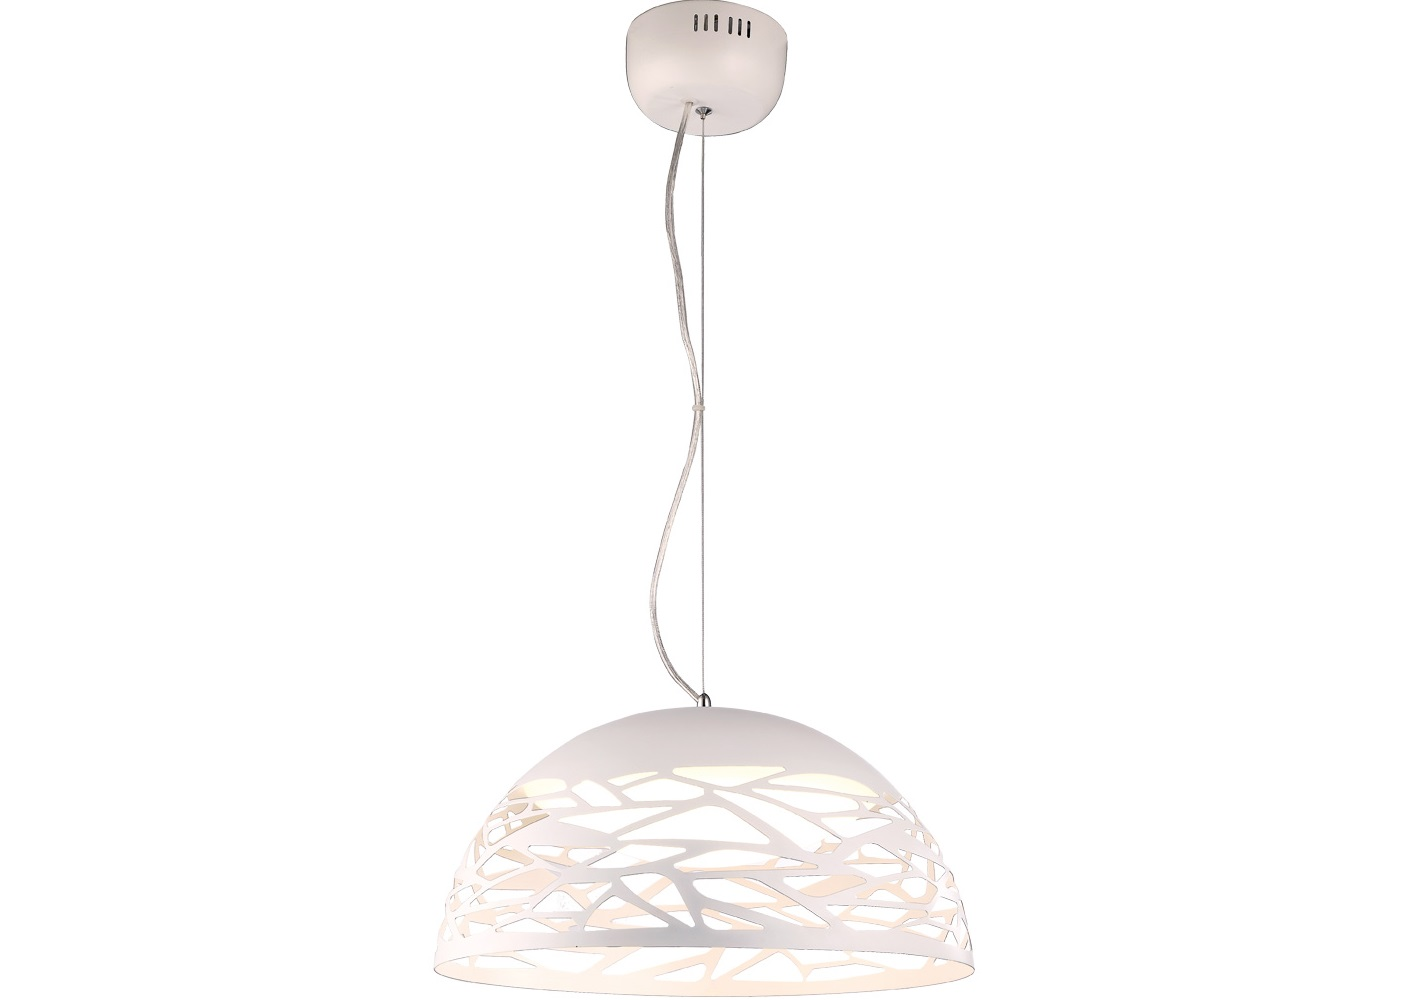 Подвесной светильникПодвесные светильники<br>&amp;lt;div&amp;gt;&amp;lt;div&amp;gt;Цоколь: LED&amp;lt;/div&amp;gt;&amp;lt;div&amp;gt;Мощность: 30W&amp;lt;/div&amp;gt;&amp;lt;div&amp;gt;Количество ламп: 1&amp;lt;/div&amp;gt;&amp;lt;/div&amp;gt;Материал: металл/металл ,поликарбонат<br><br>Material: Металл<br>Height см: 20<br>Diameter см: 41